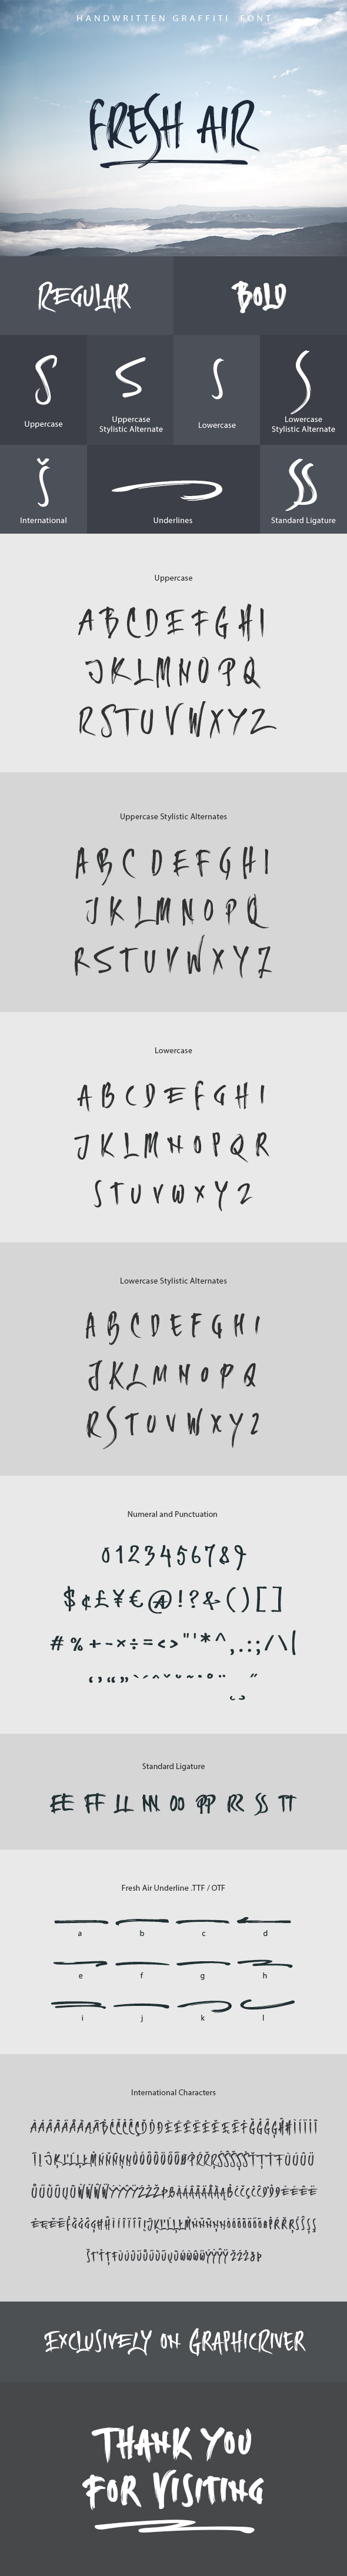 Fresh Air Handwritten Graffiti Font - Hand-writing Script